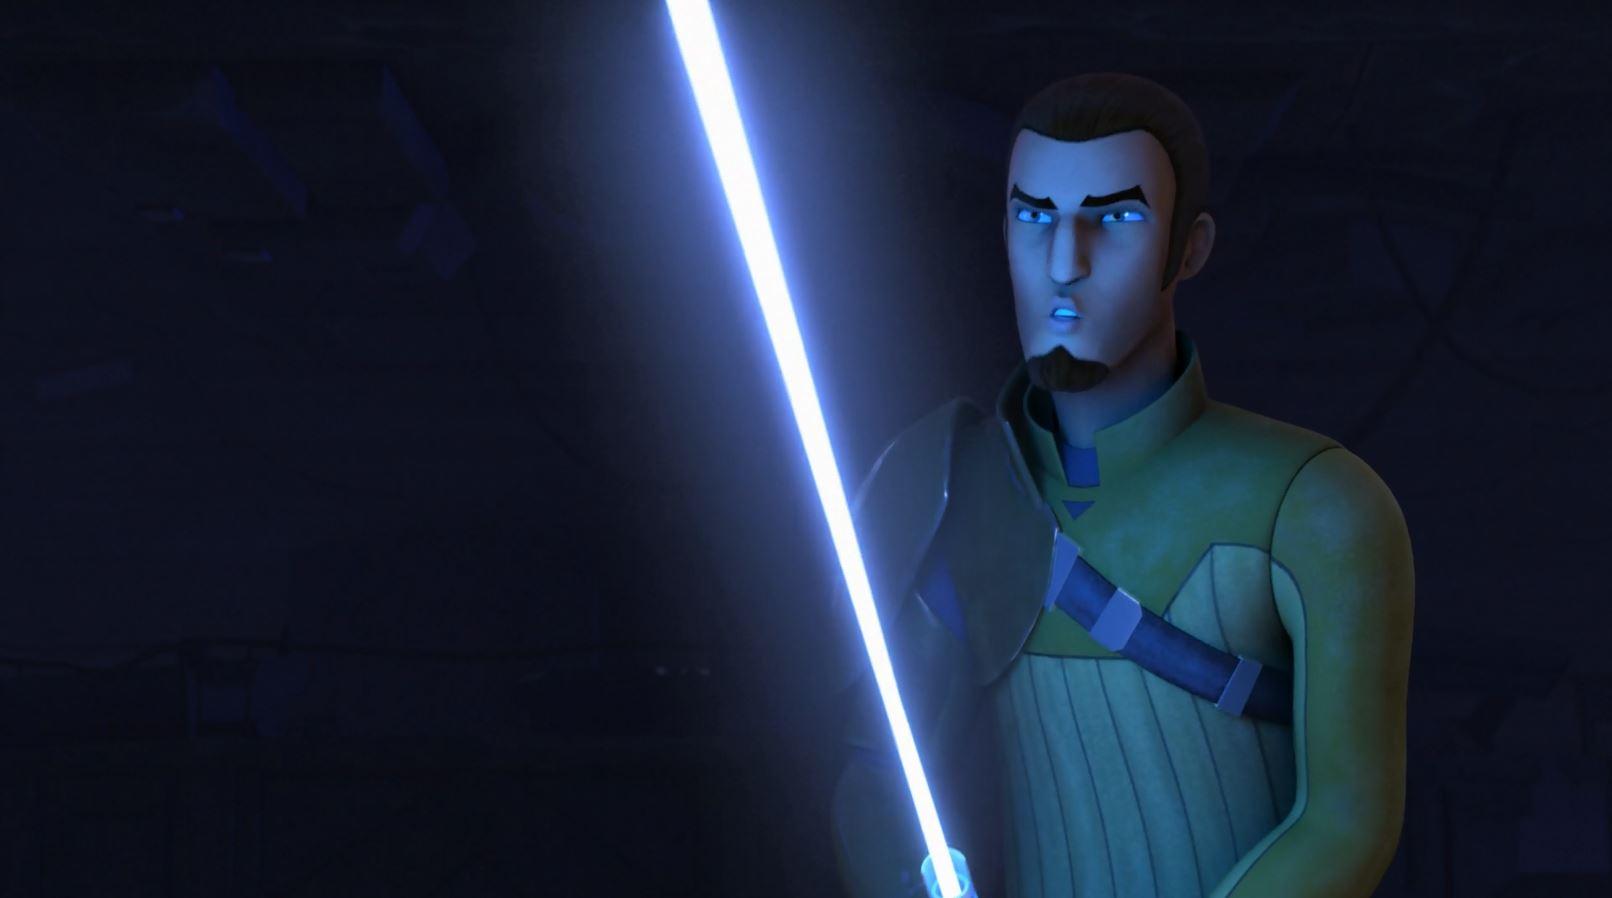 Kanan Jarrus. Star Wars Rebels Gathering Forces Review